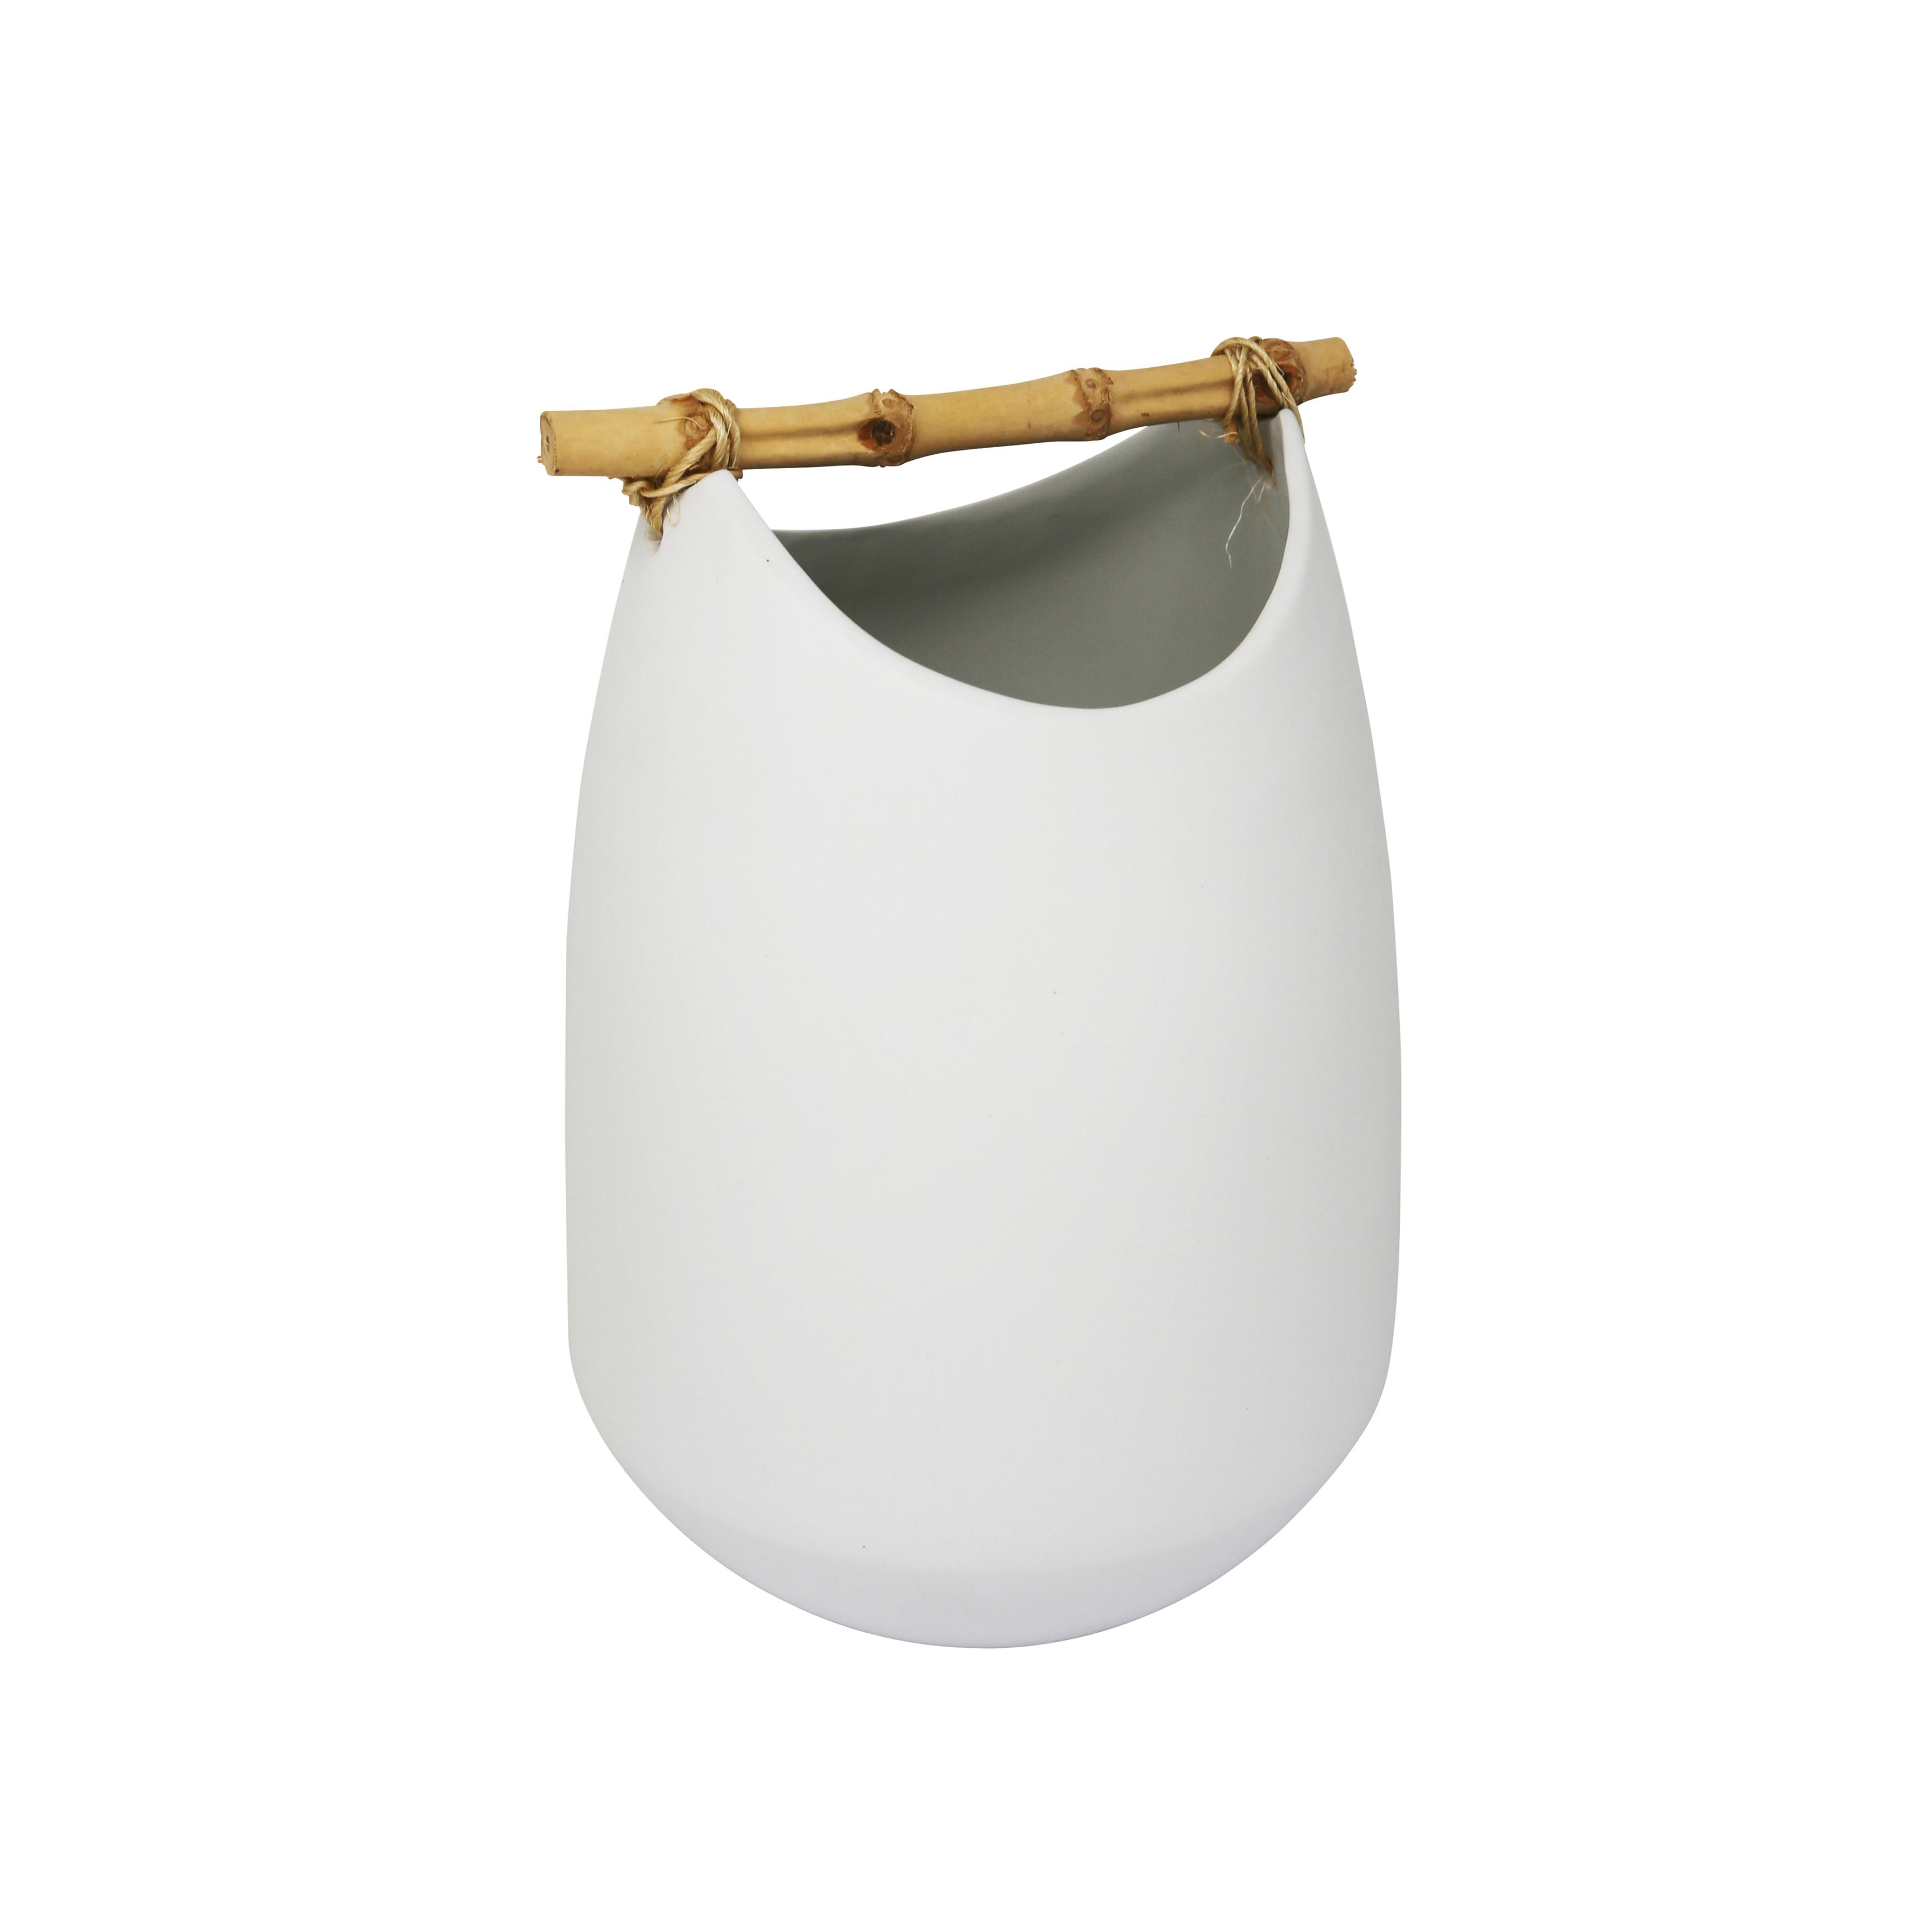 Unique Shape Ceramic Vase with Bamboo Handle, Small, Matte White